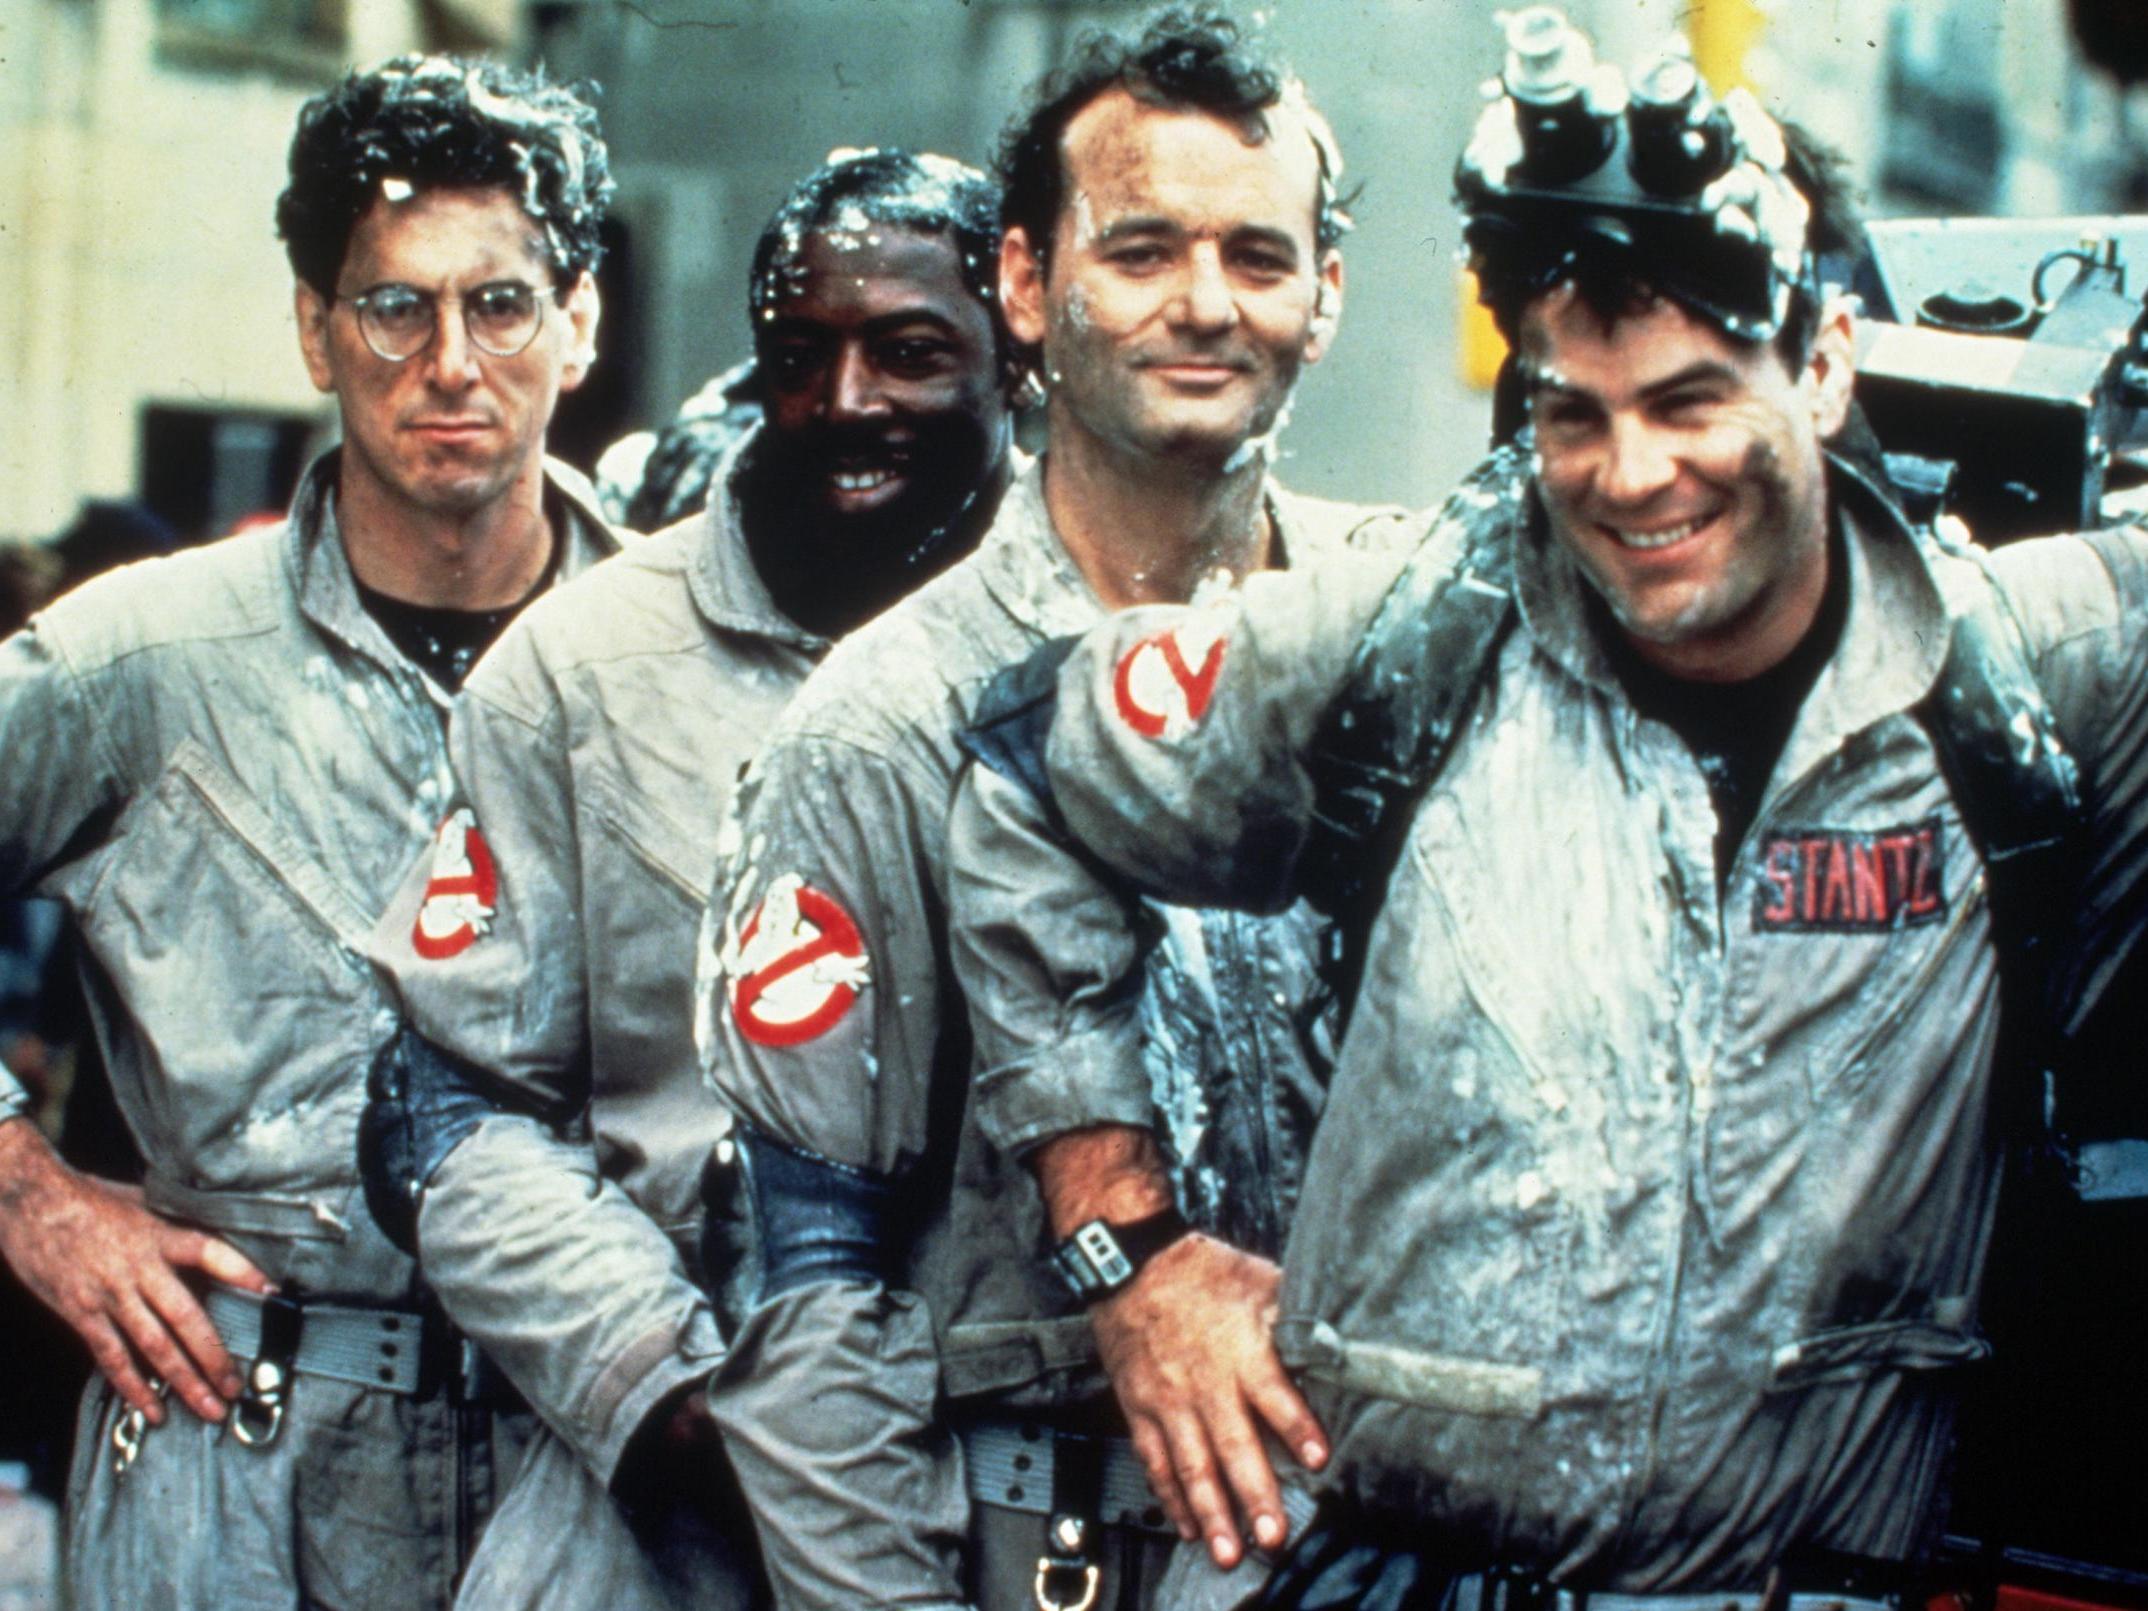 Ghostbusters sequel: Ernie Hudson, Bill Murray and Dan Aykroyd are 'in'